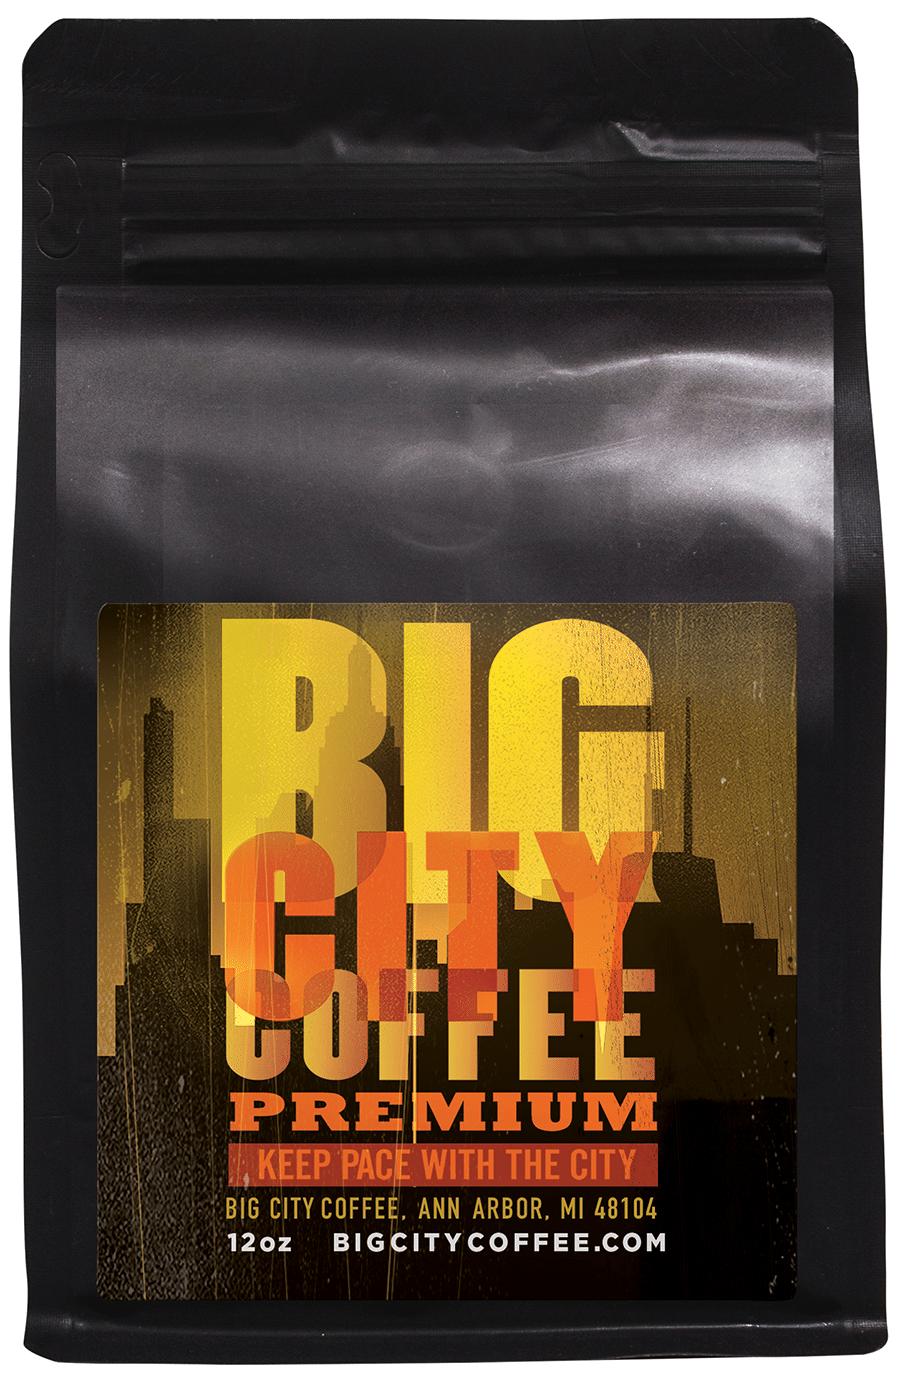 BCC-BIG-CITY-NEW-900x1380